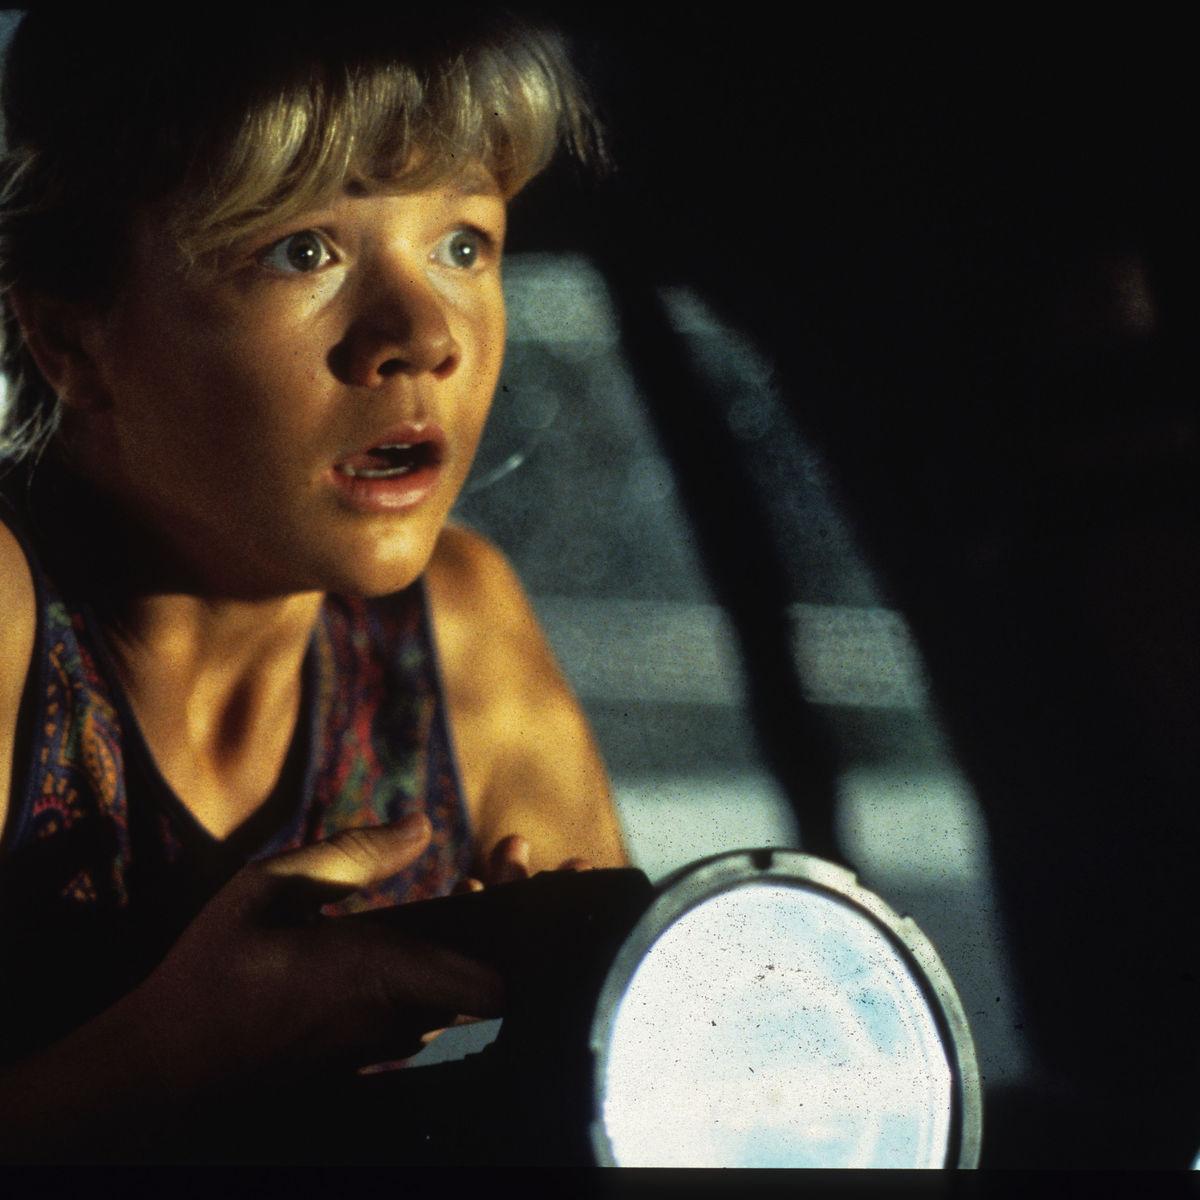 Ariana Richards as Lex in Jurassic Park